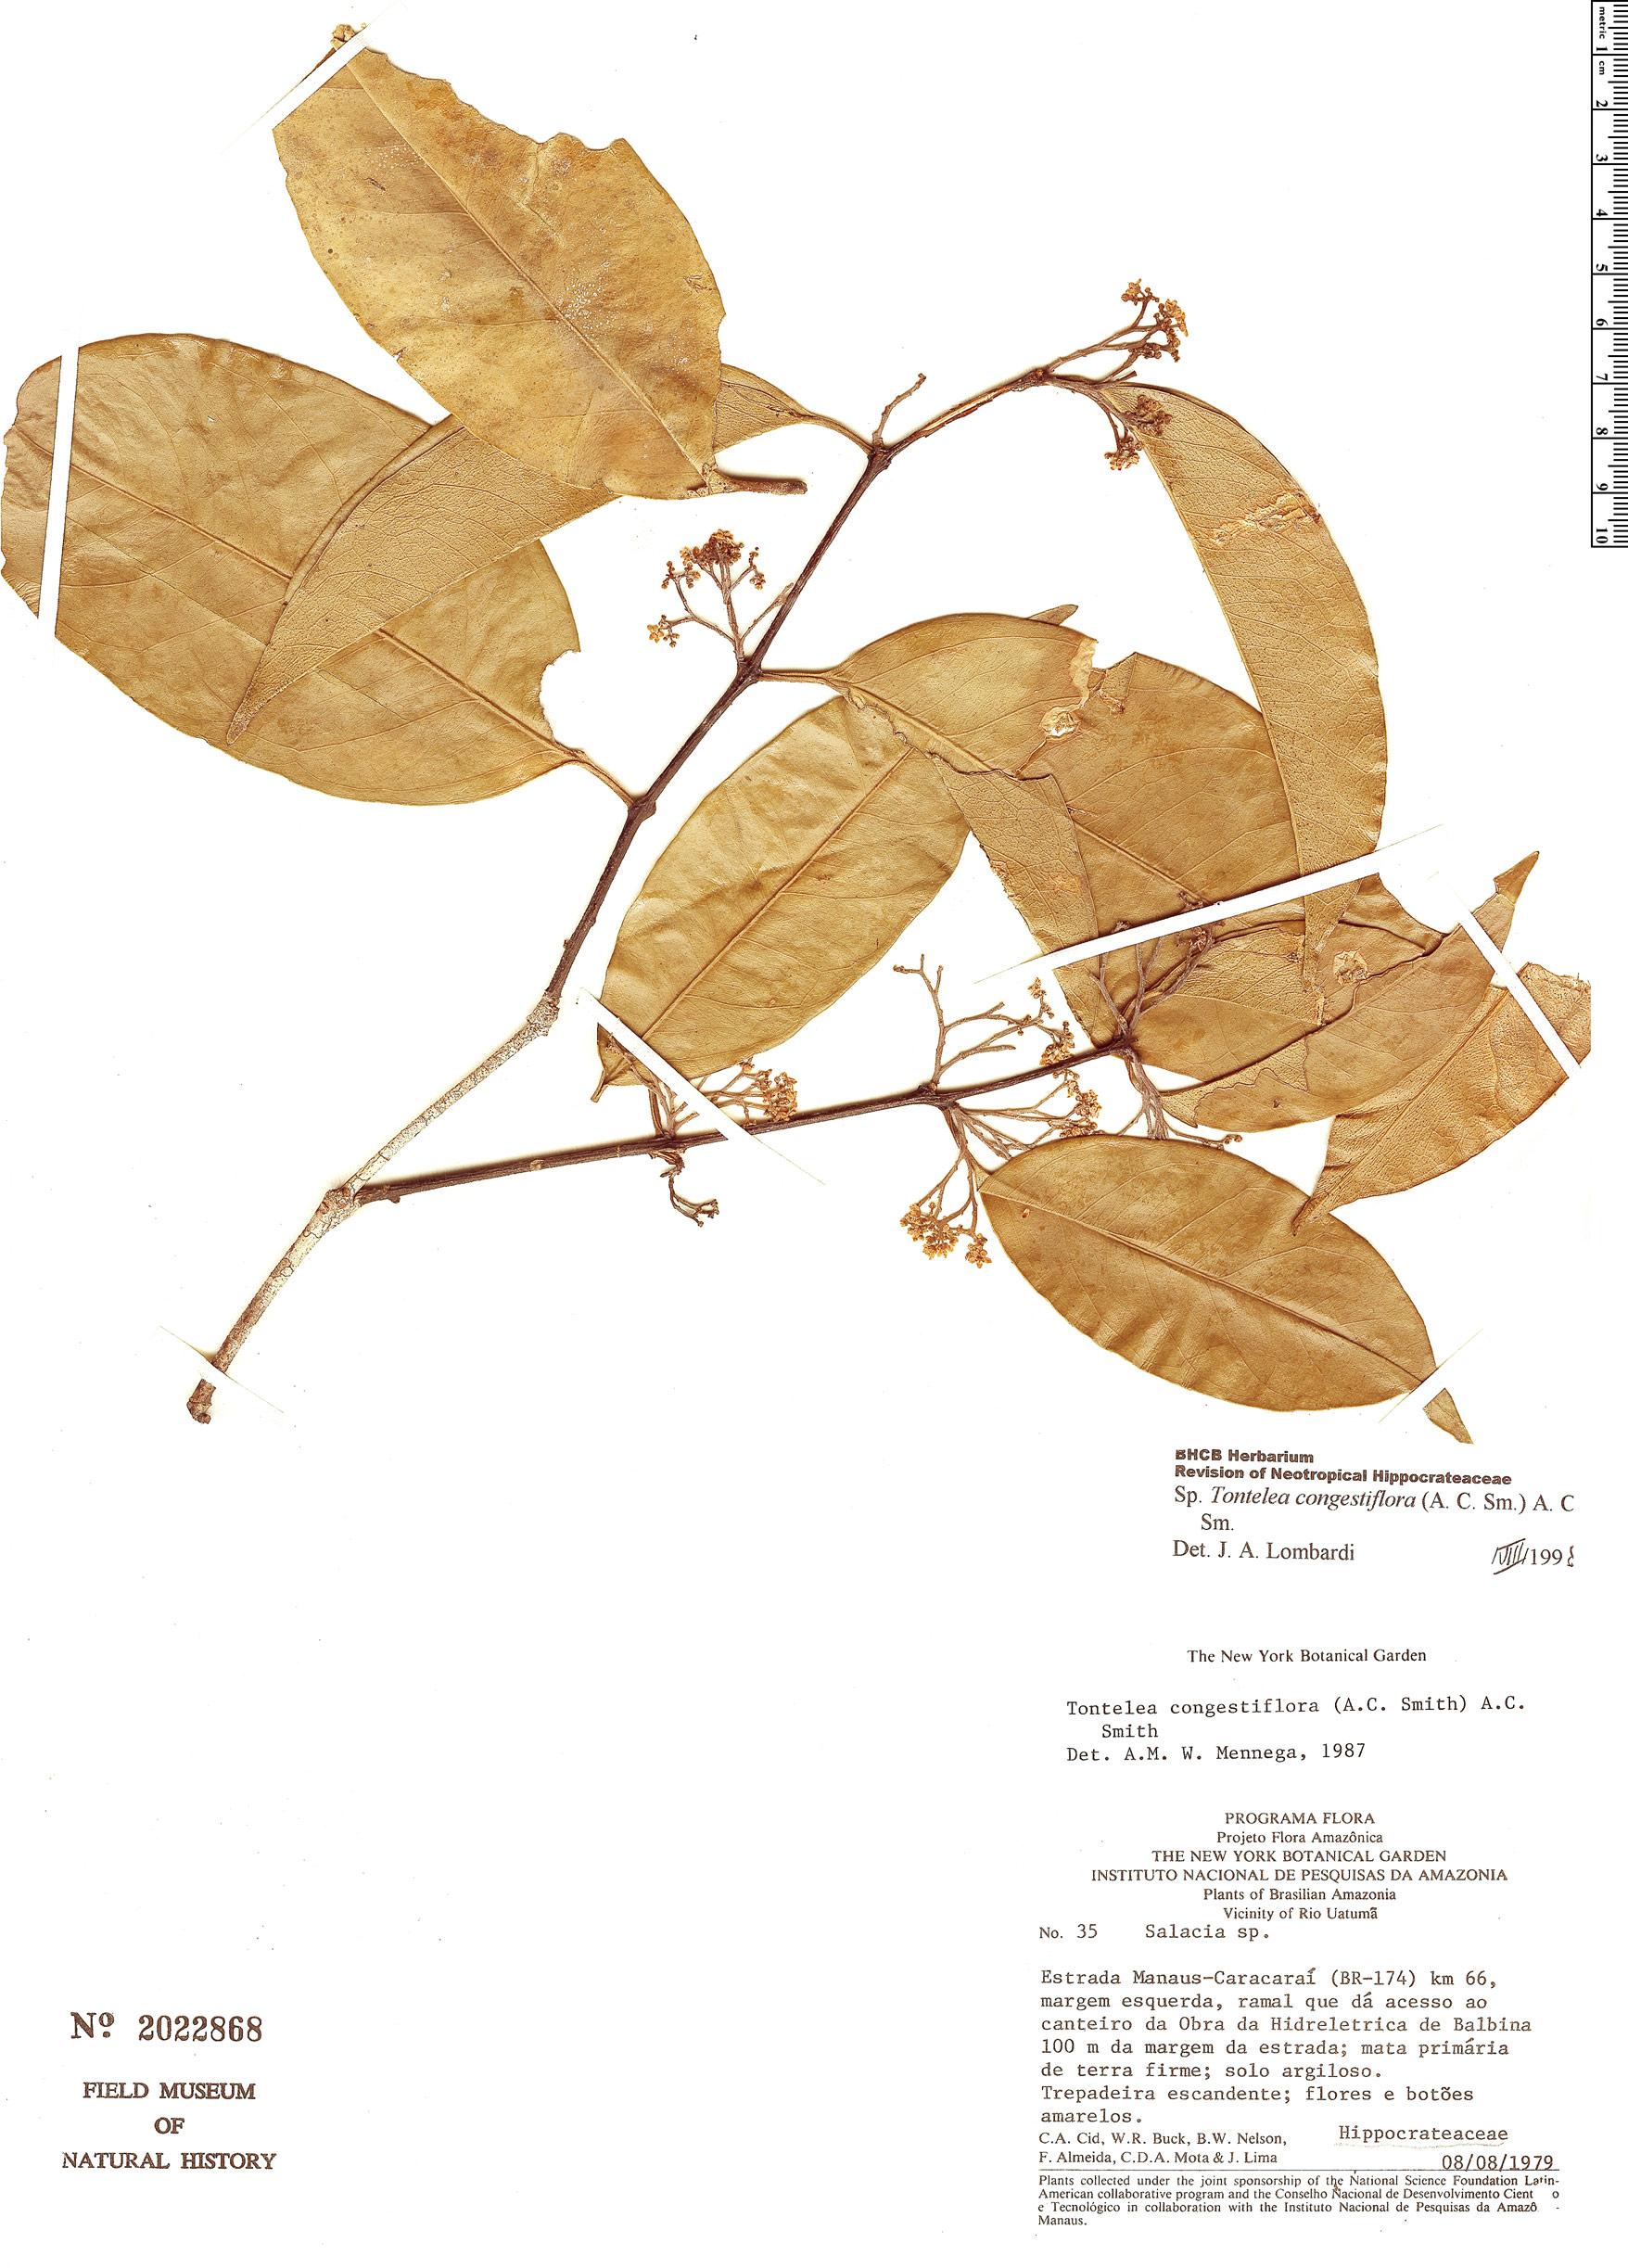 Specimen: Tontelea congestiflora